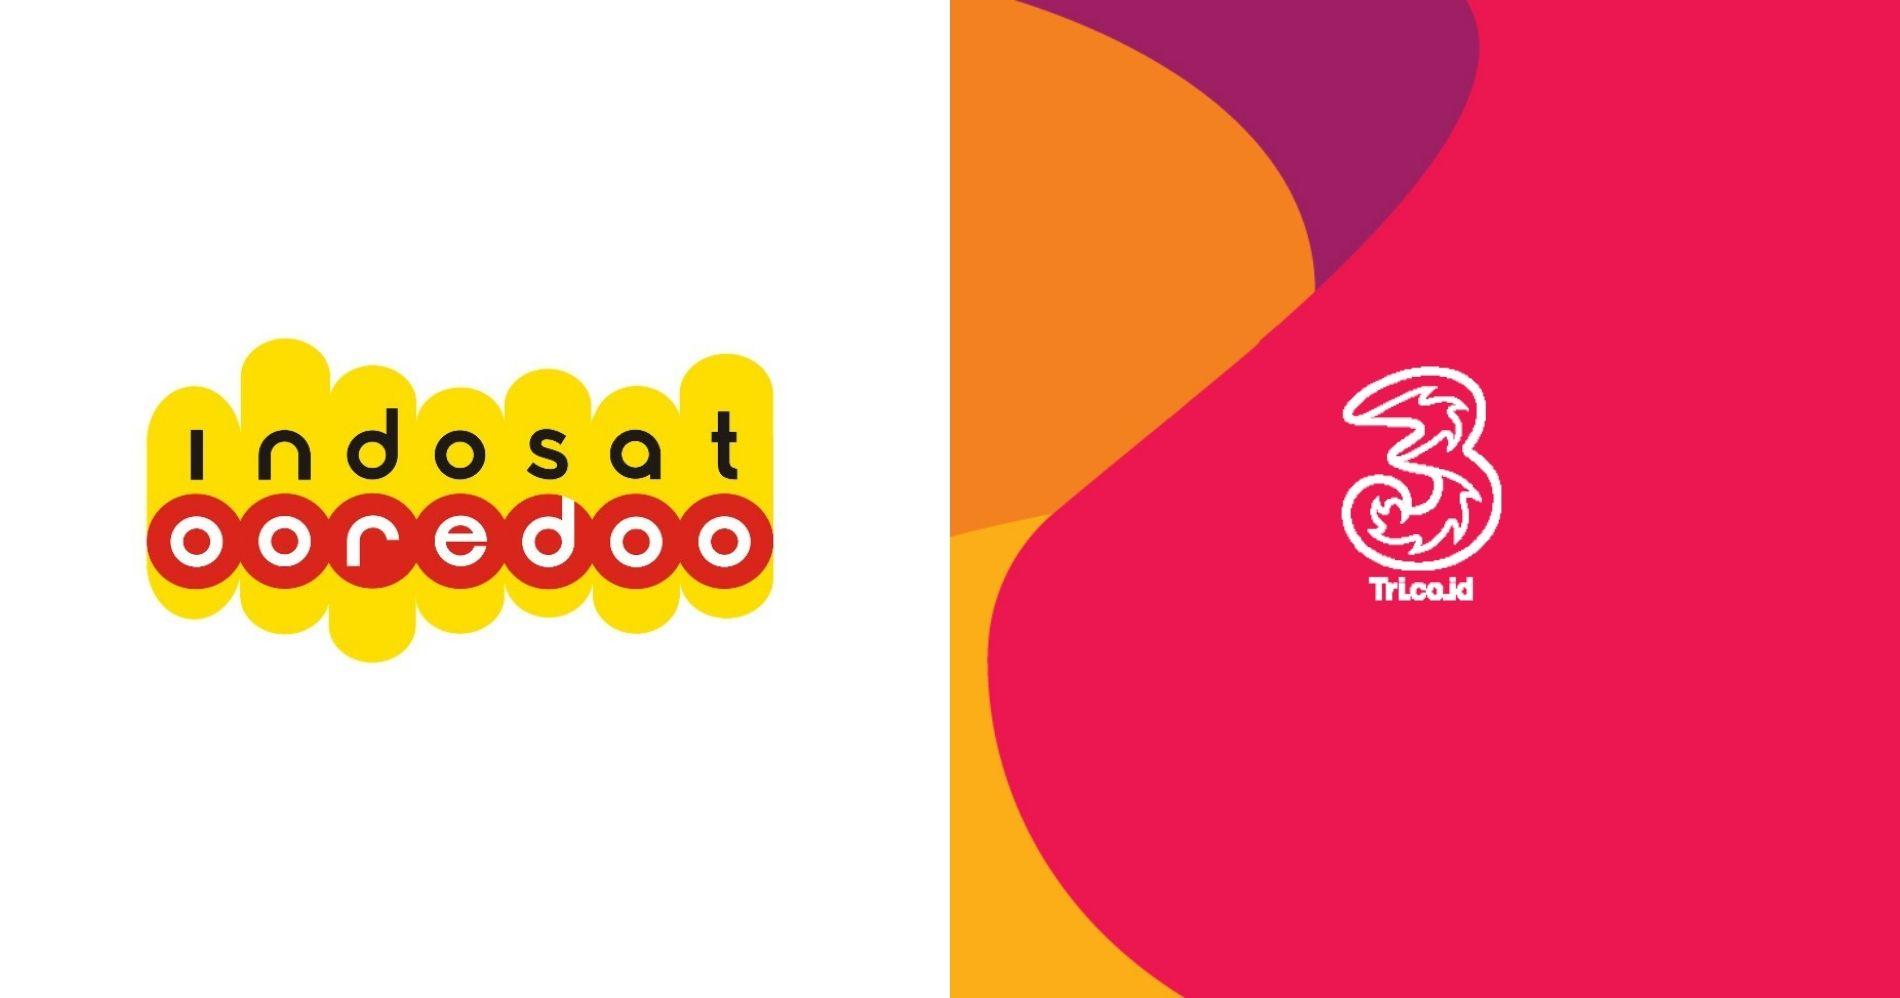 Merger Indosat-Tri Illustration Web Bisnis Muda - Image: Indosat Ooredoo & Tri Indonesia